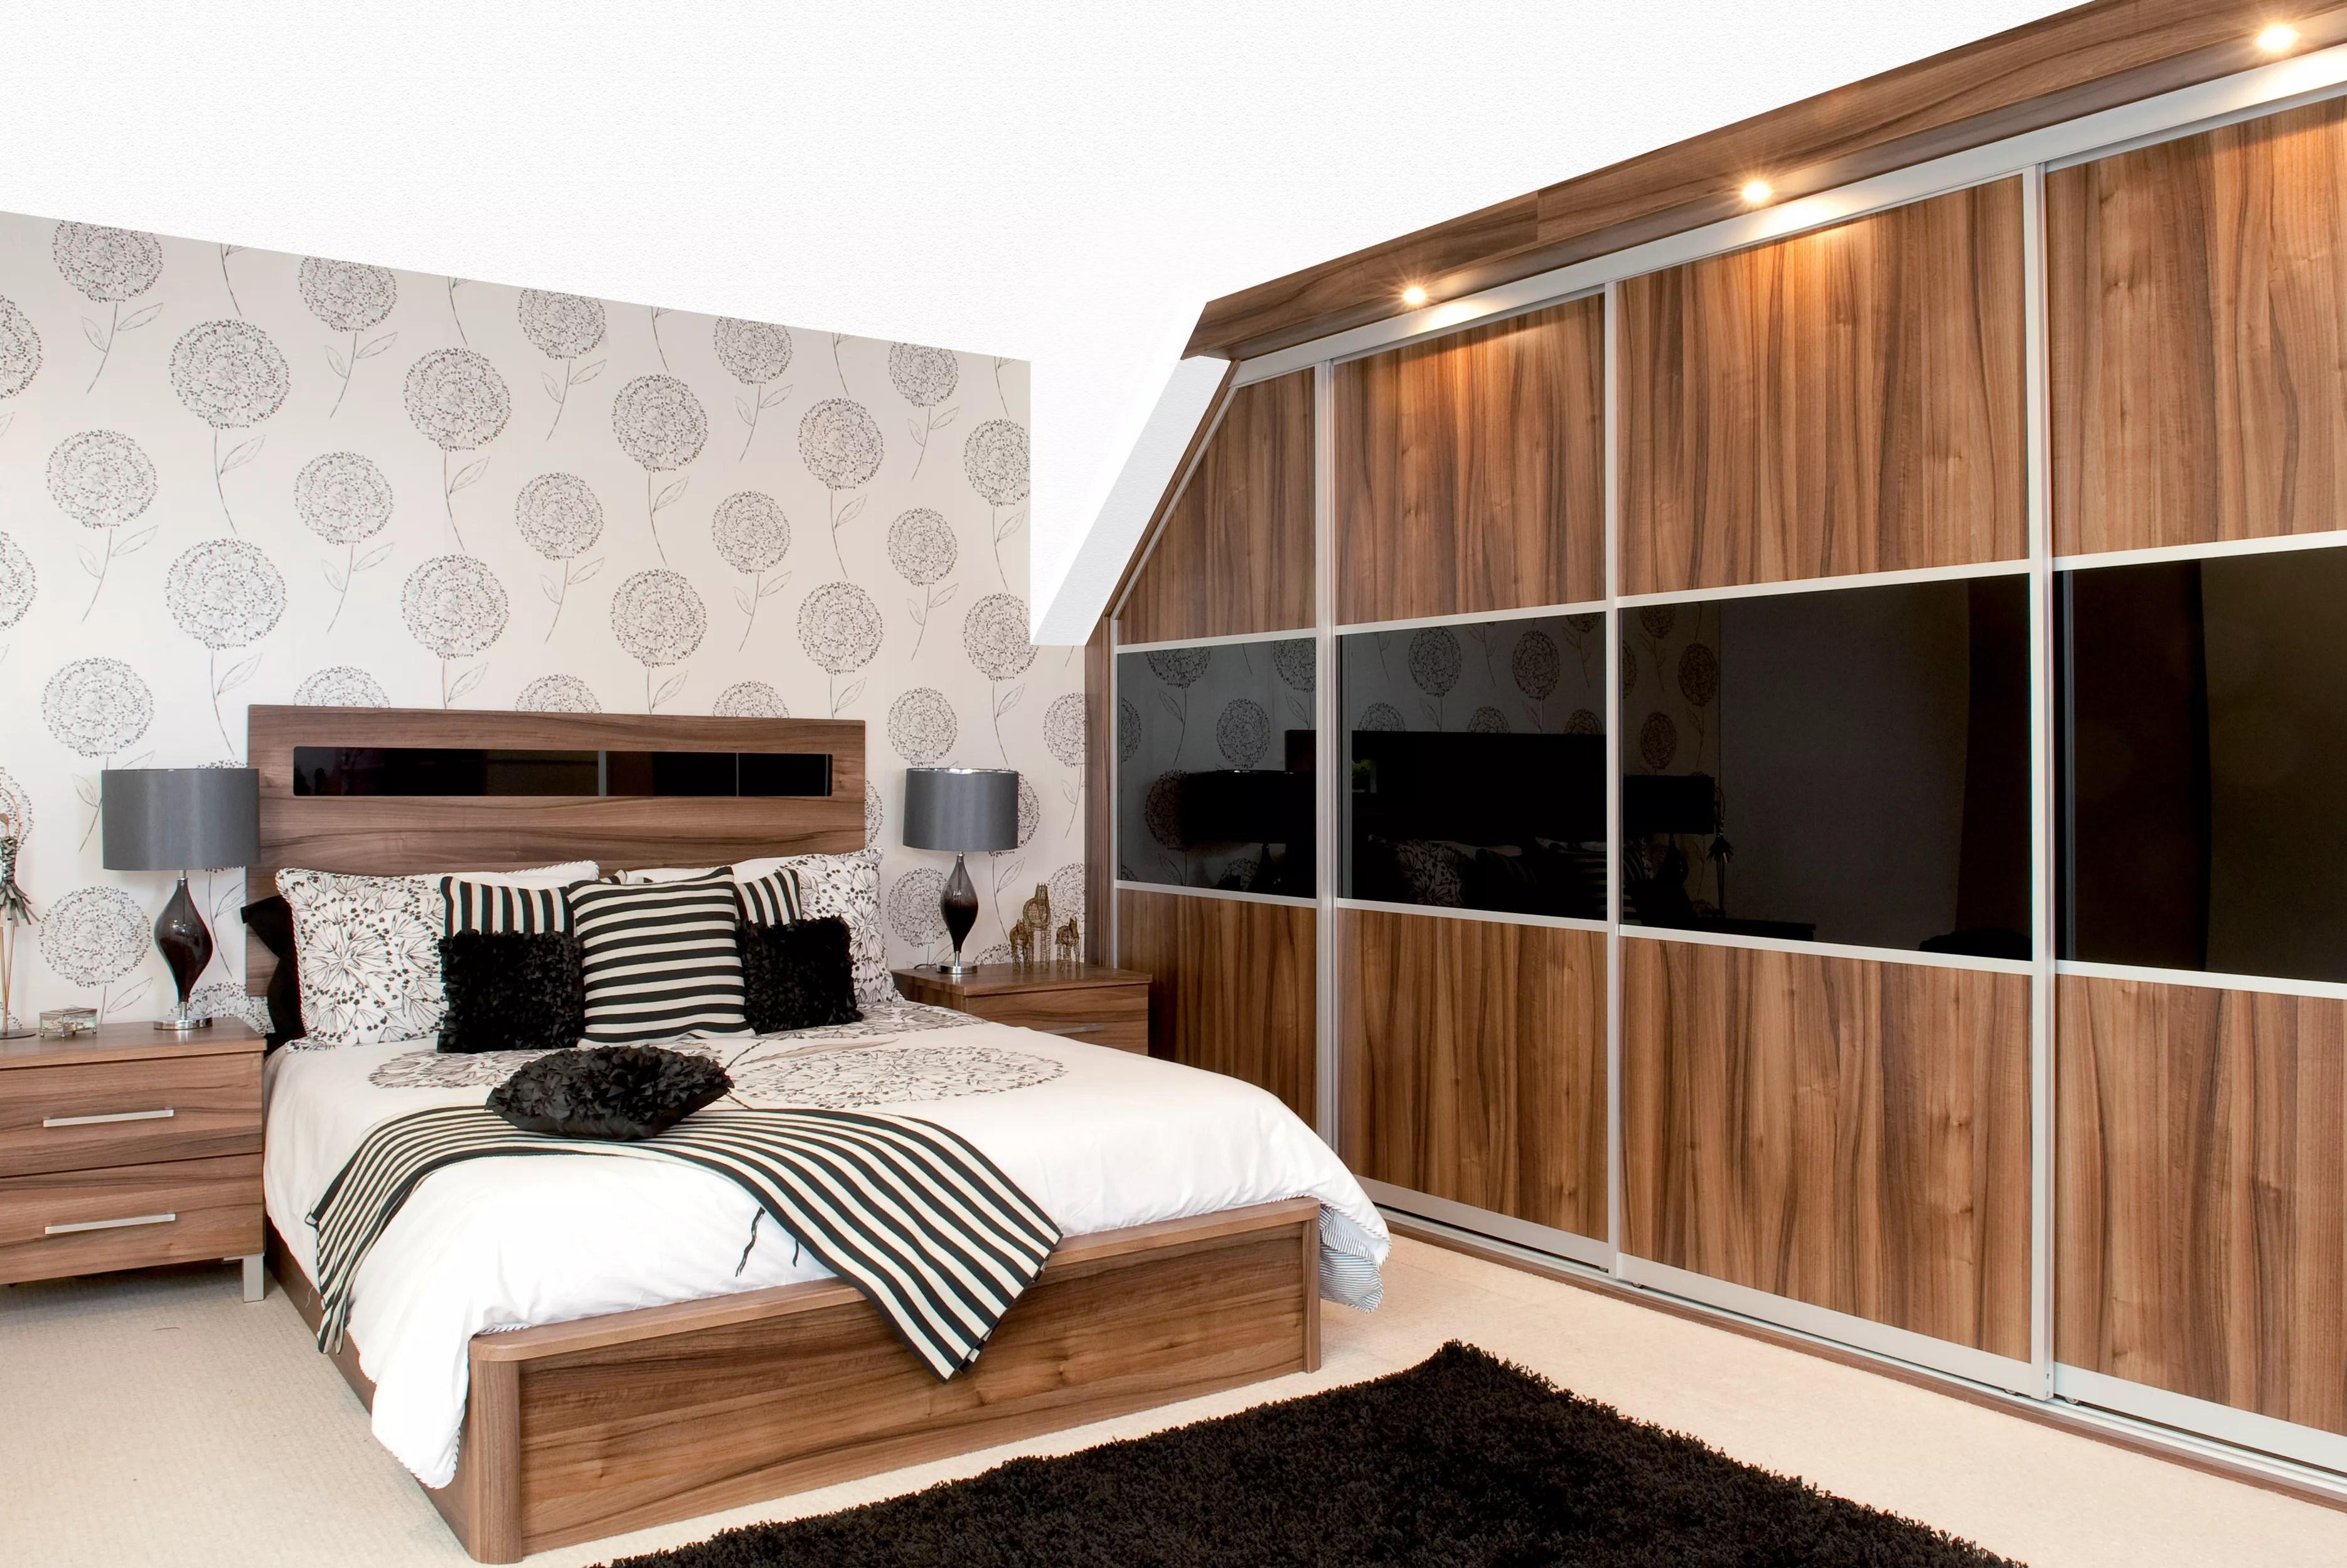 Bedroom Storage Buying Guide